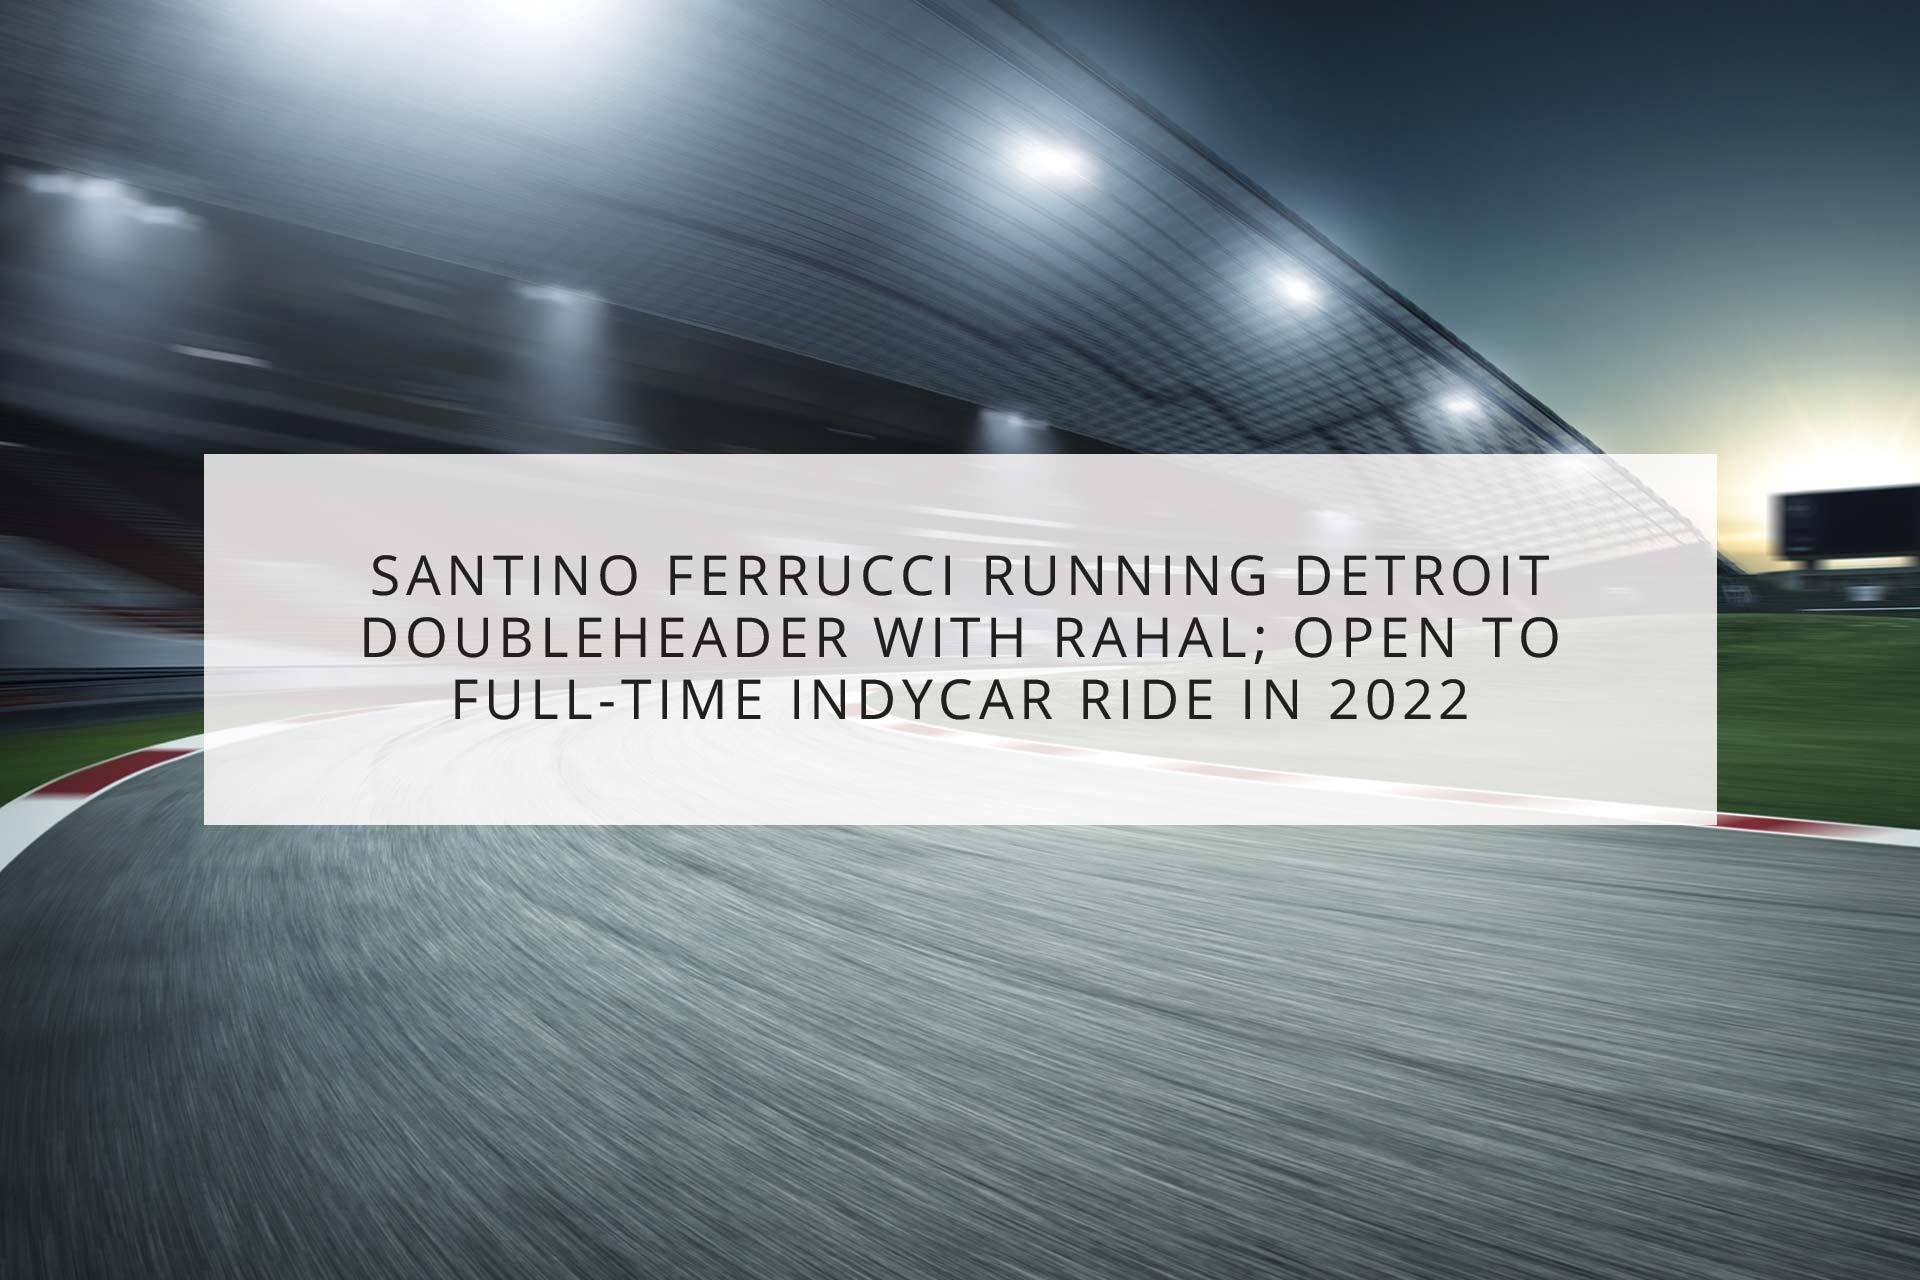 Santino Ferrucci running Detroit doubleheader with Rahal